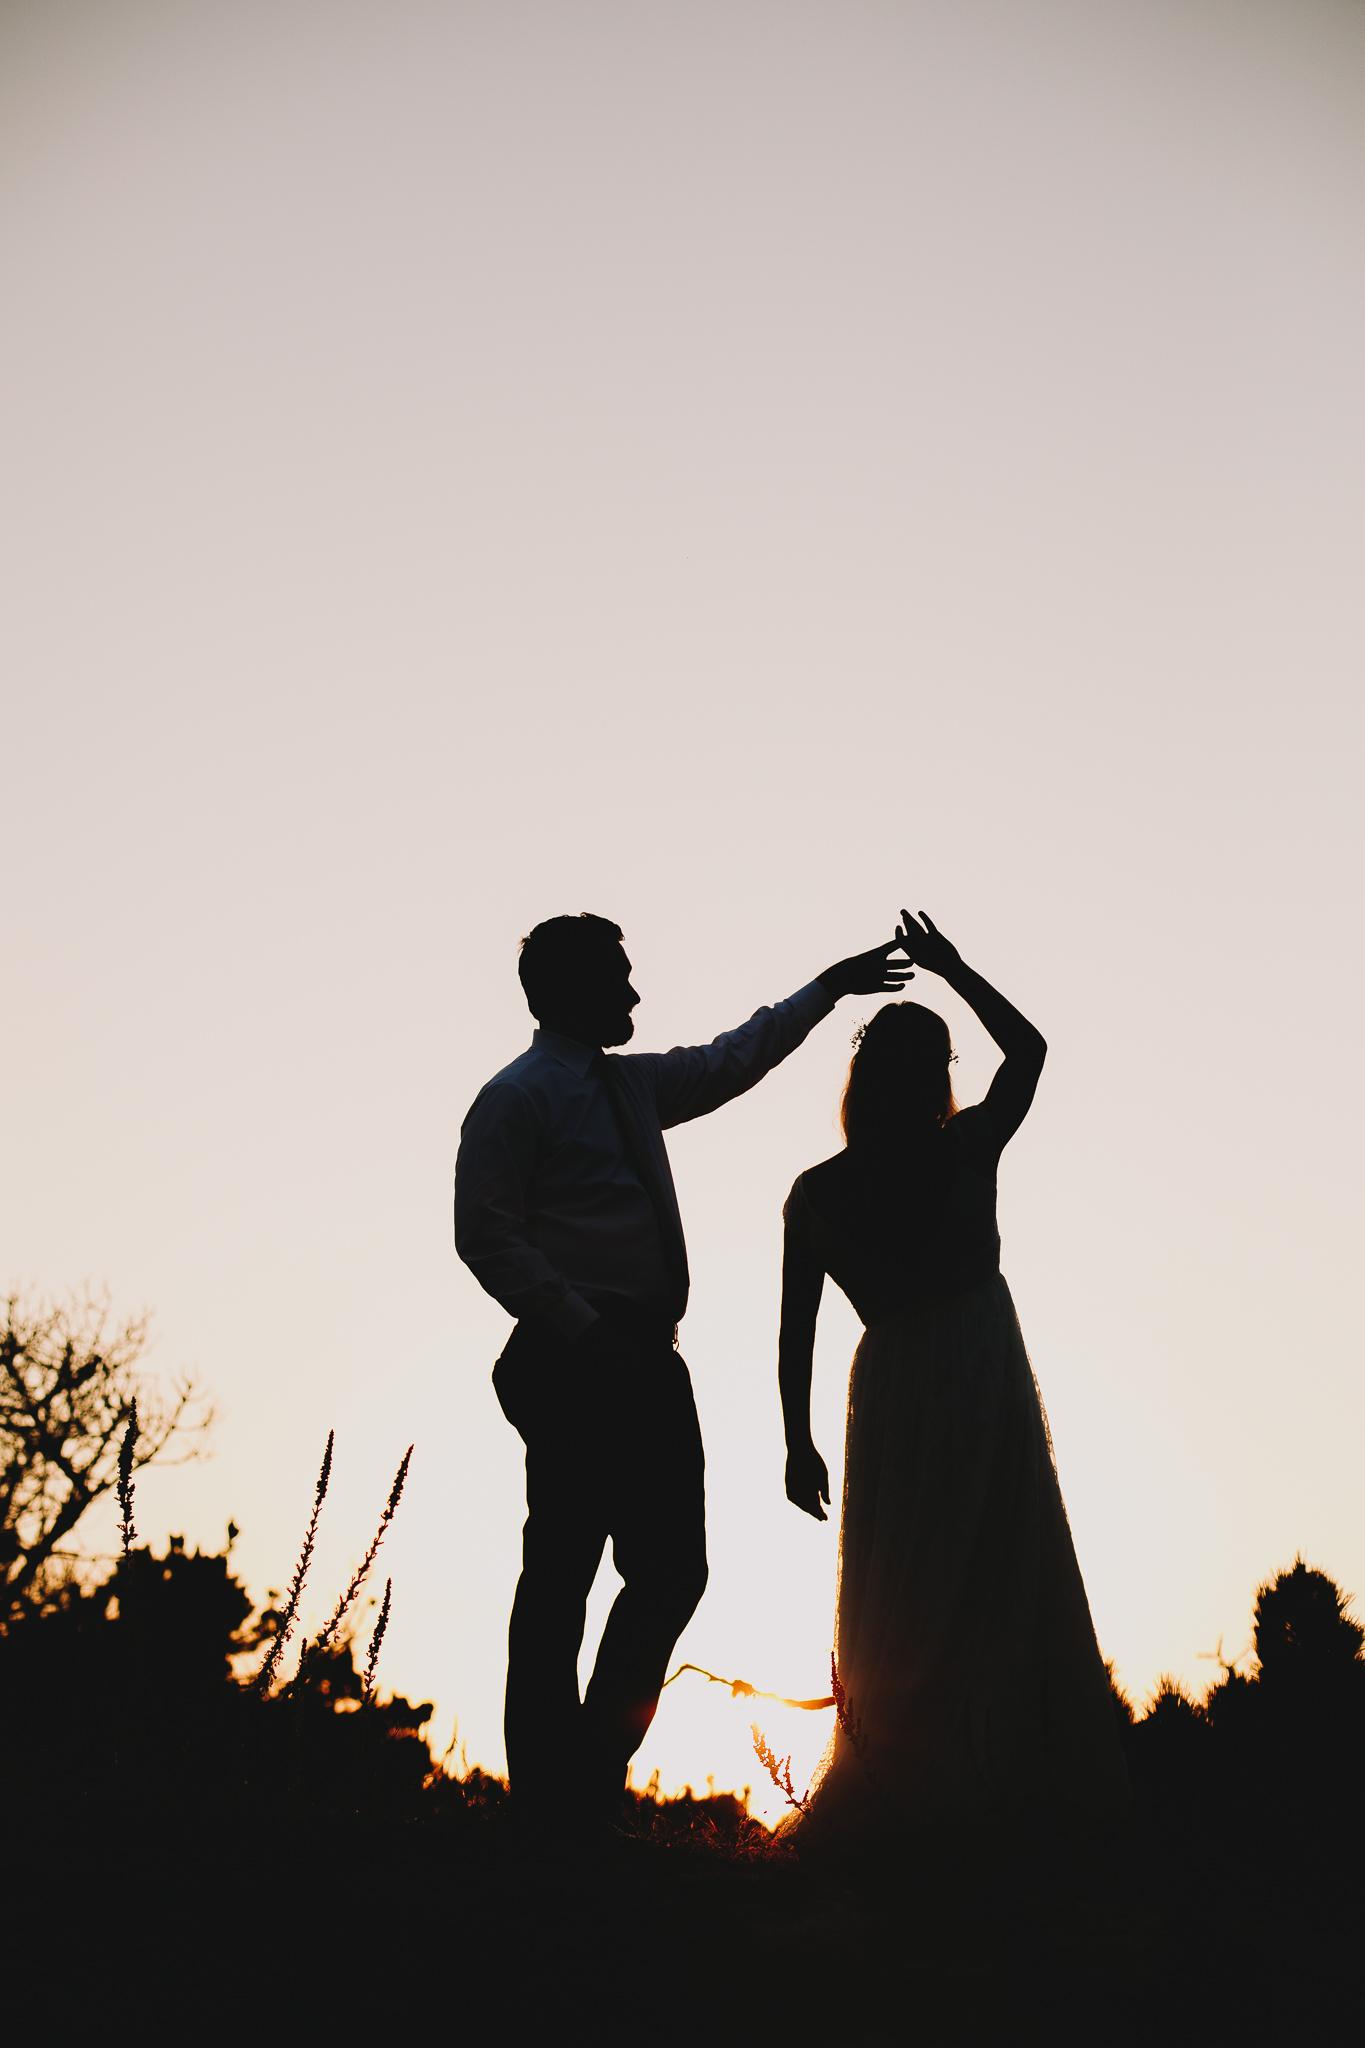 Archer_Inspired_Photography_Pacific_Grove_Ansilomar_Beach_Carmel_Valley_Wedding-164.jpg